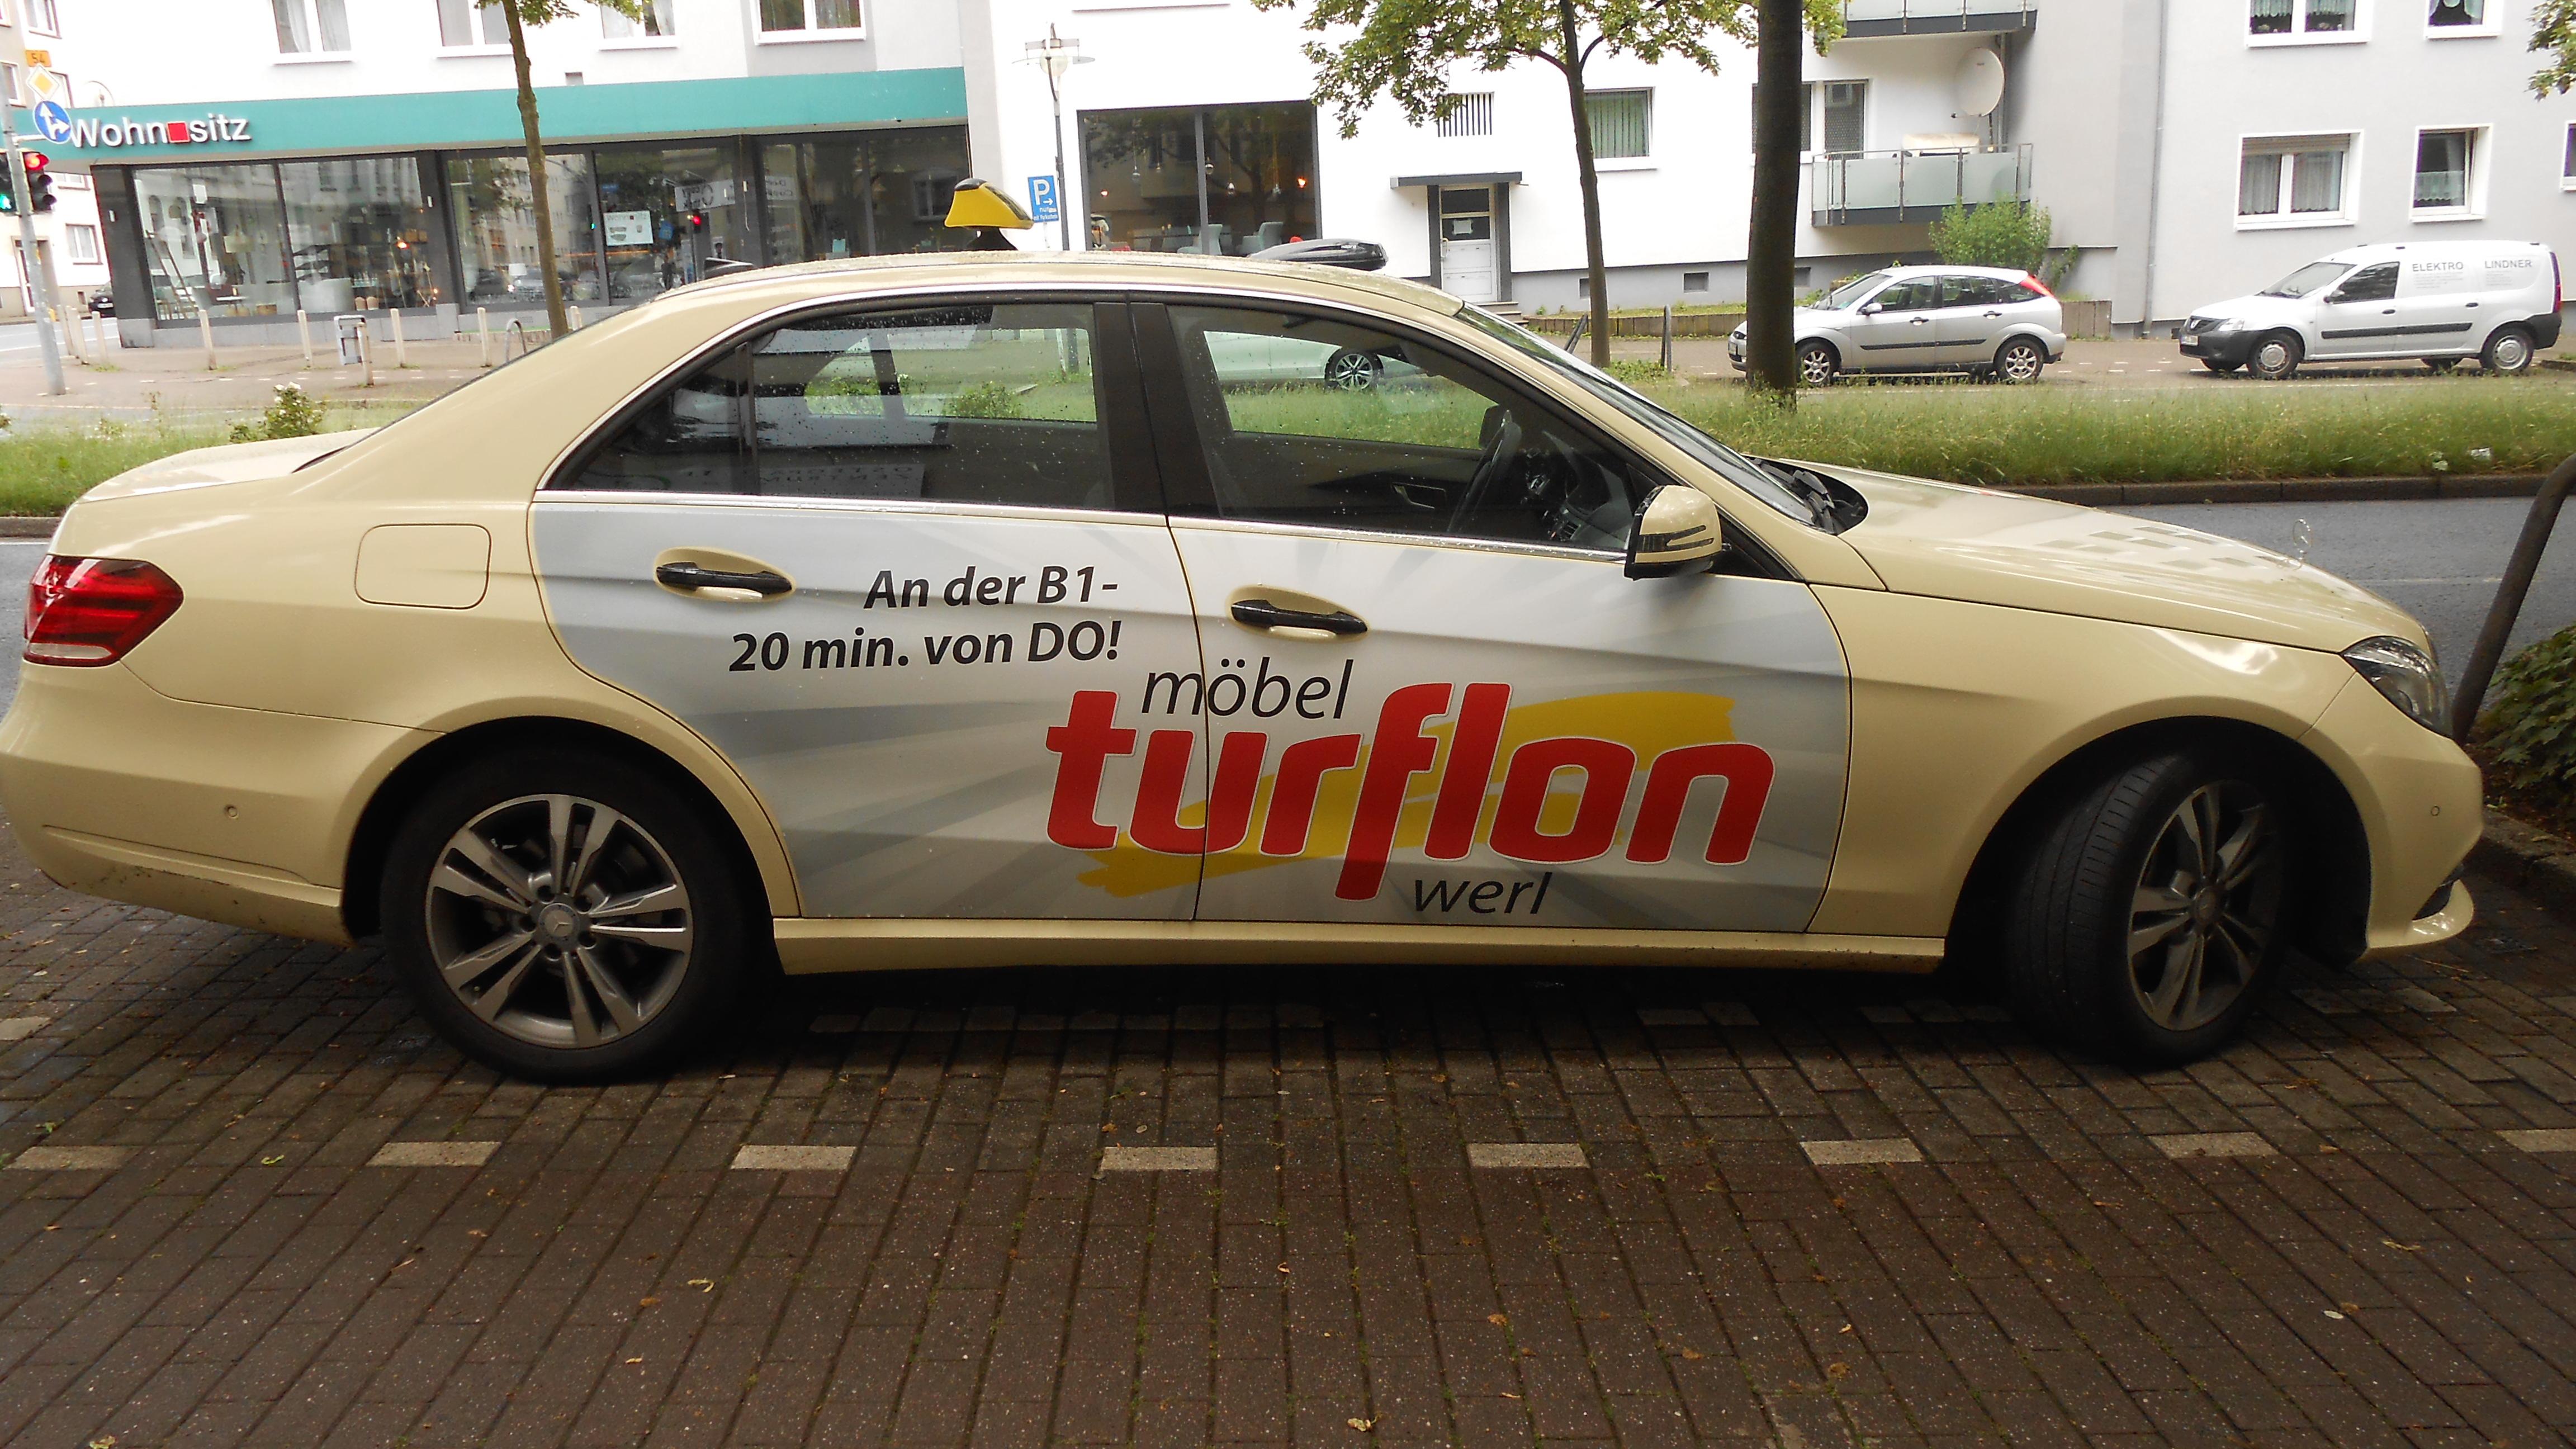 File:Taxi Dortmund, Turflon.jpg - Wikimedia Commons